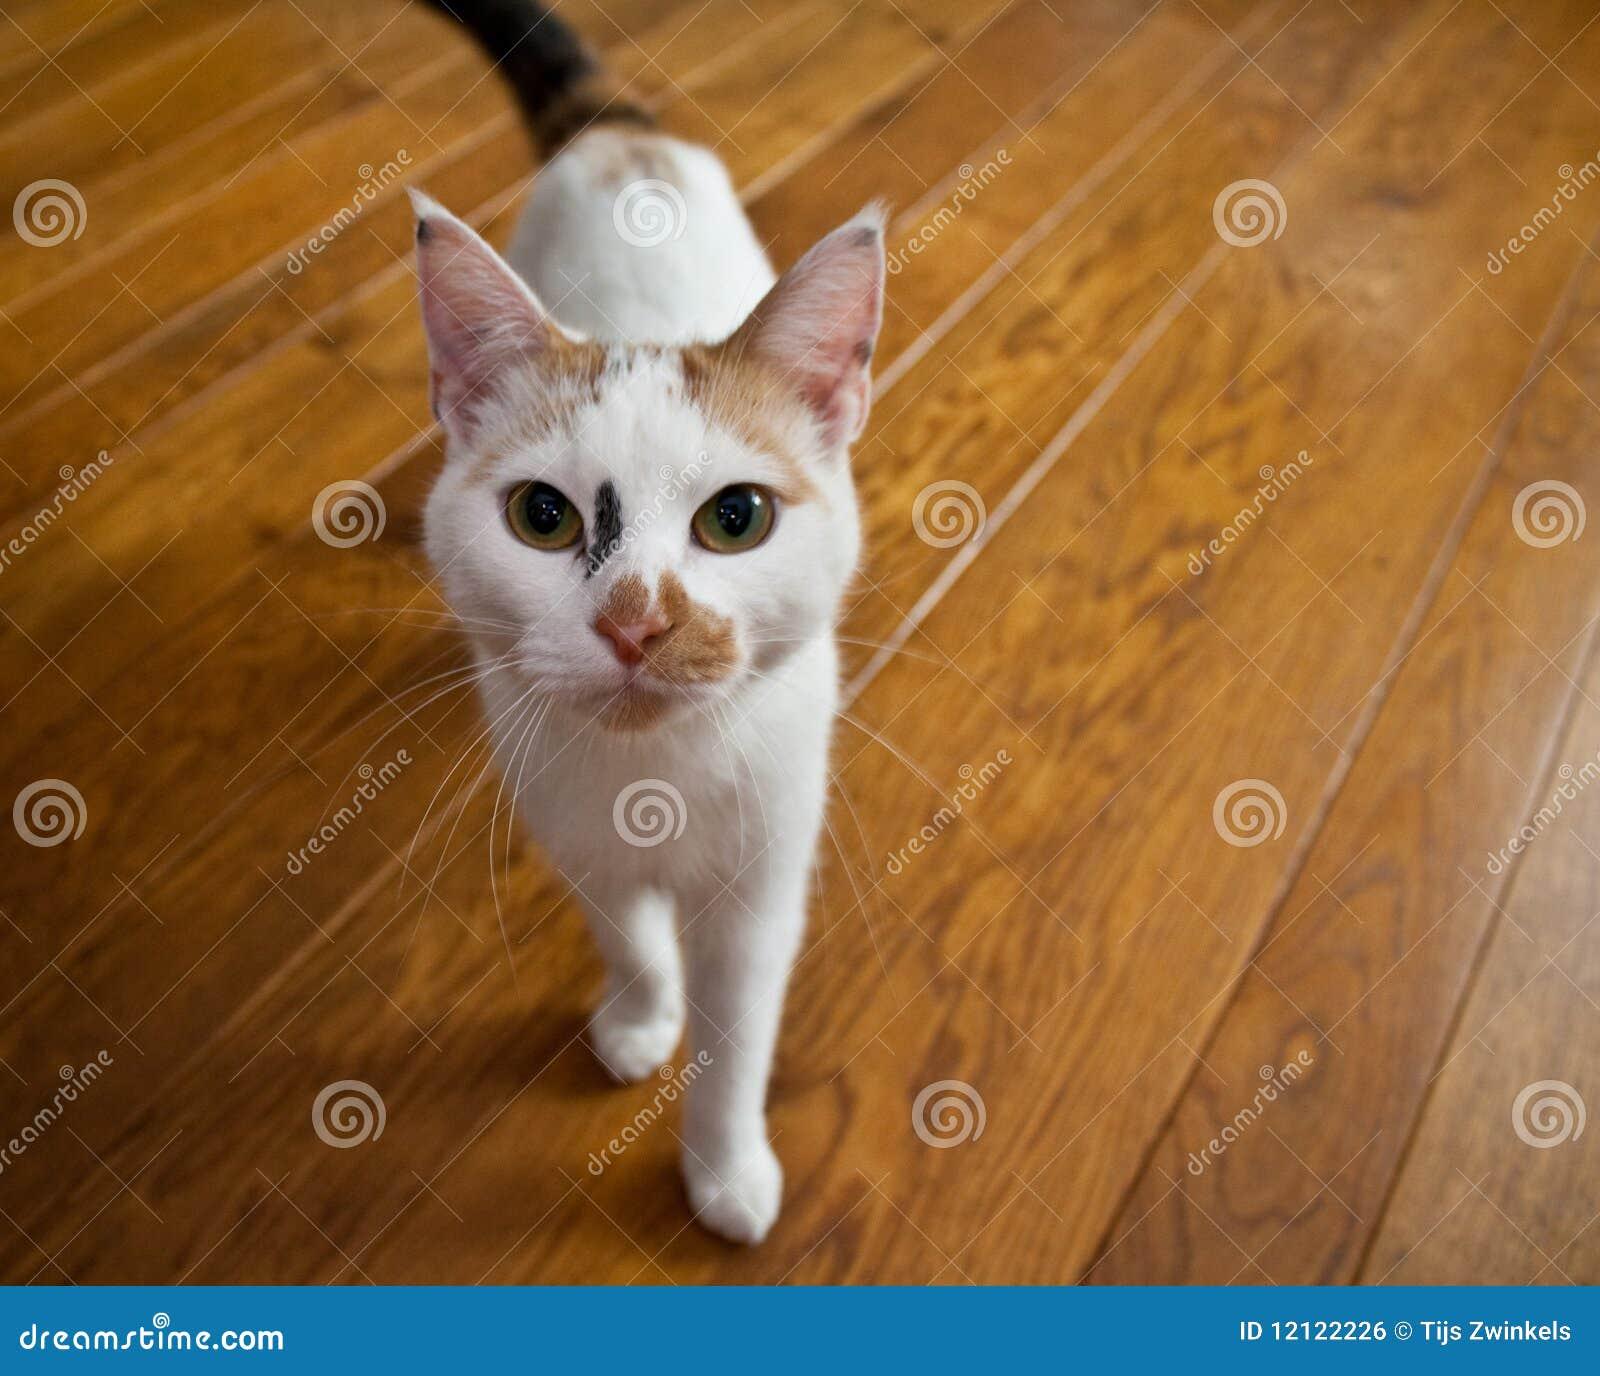 Cat on Wooden Floor stock photo. Image of eyes, depth ...